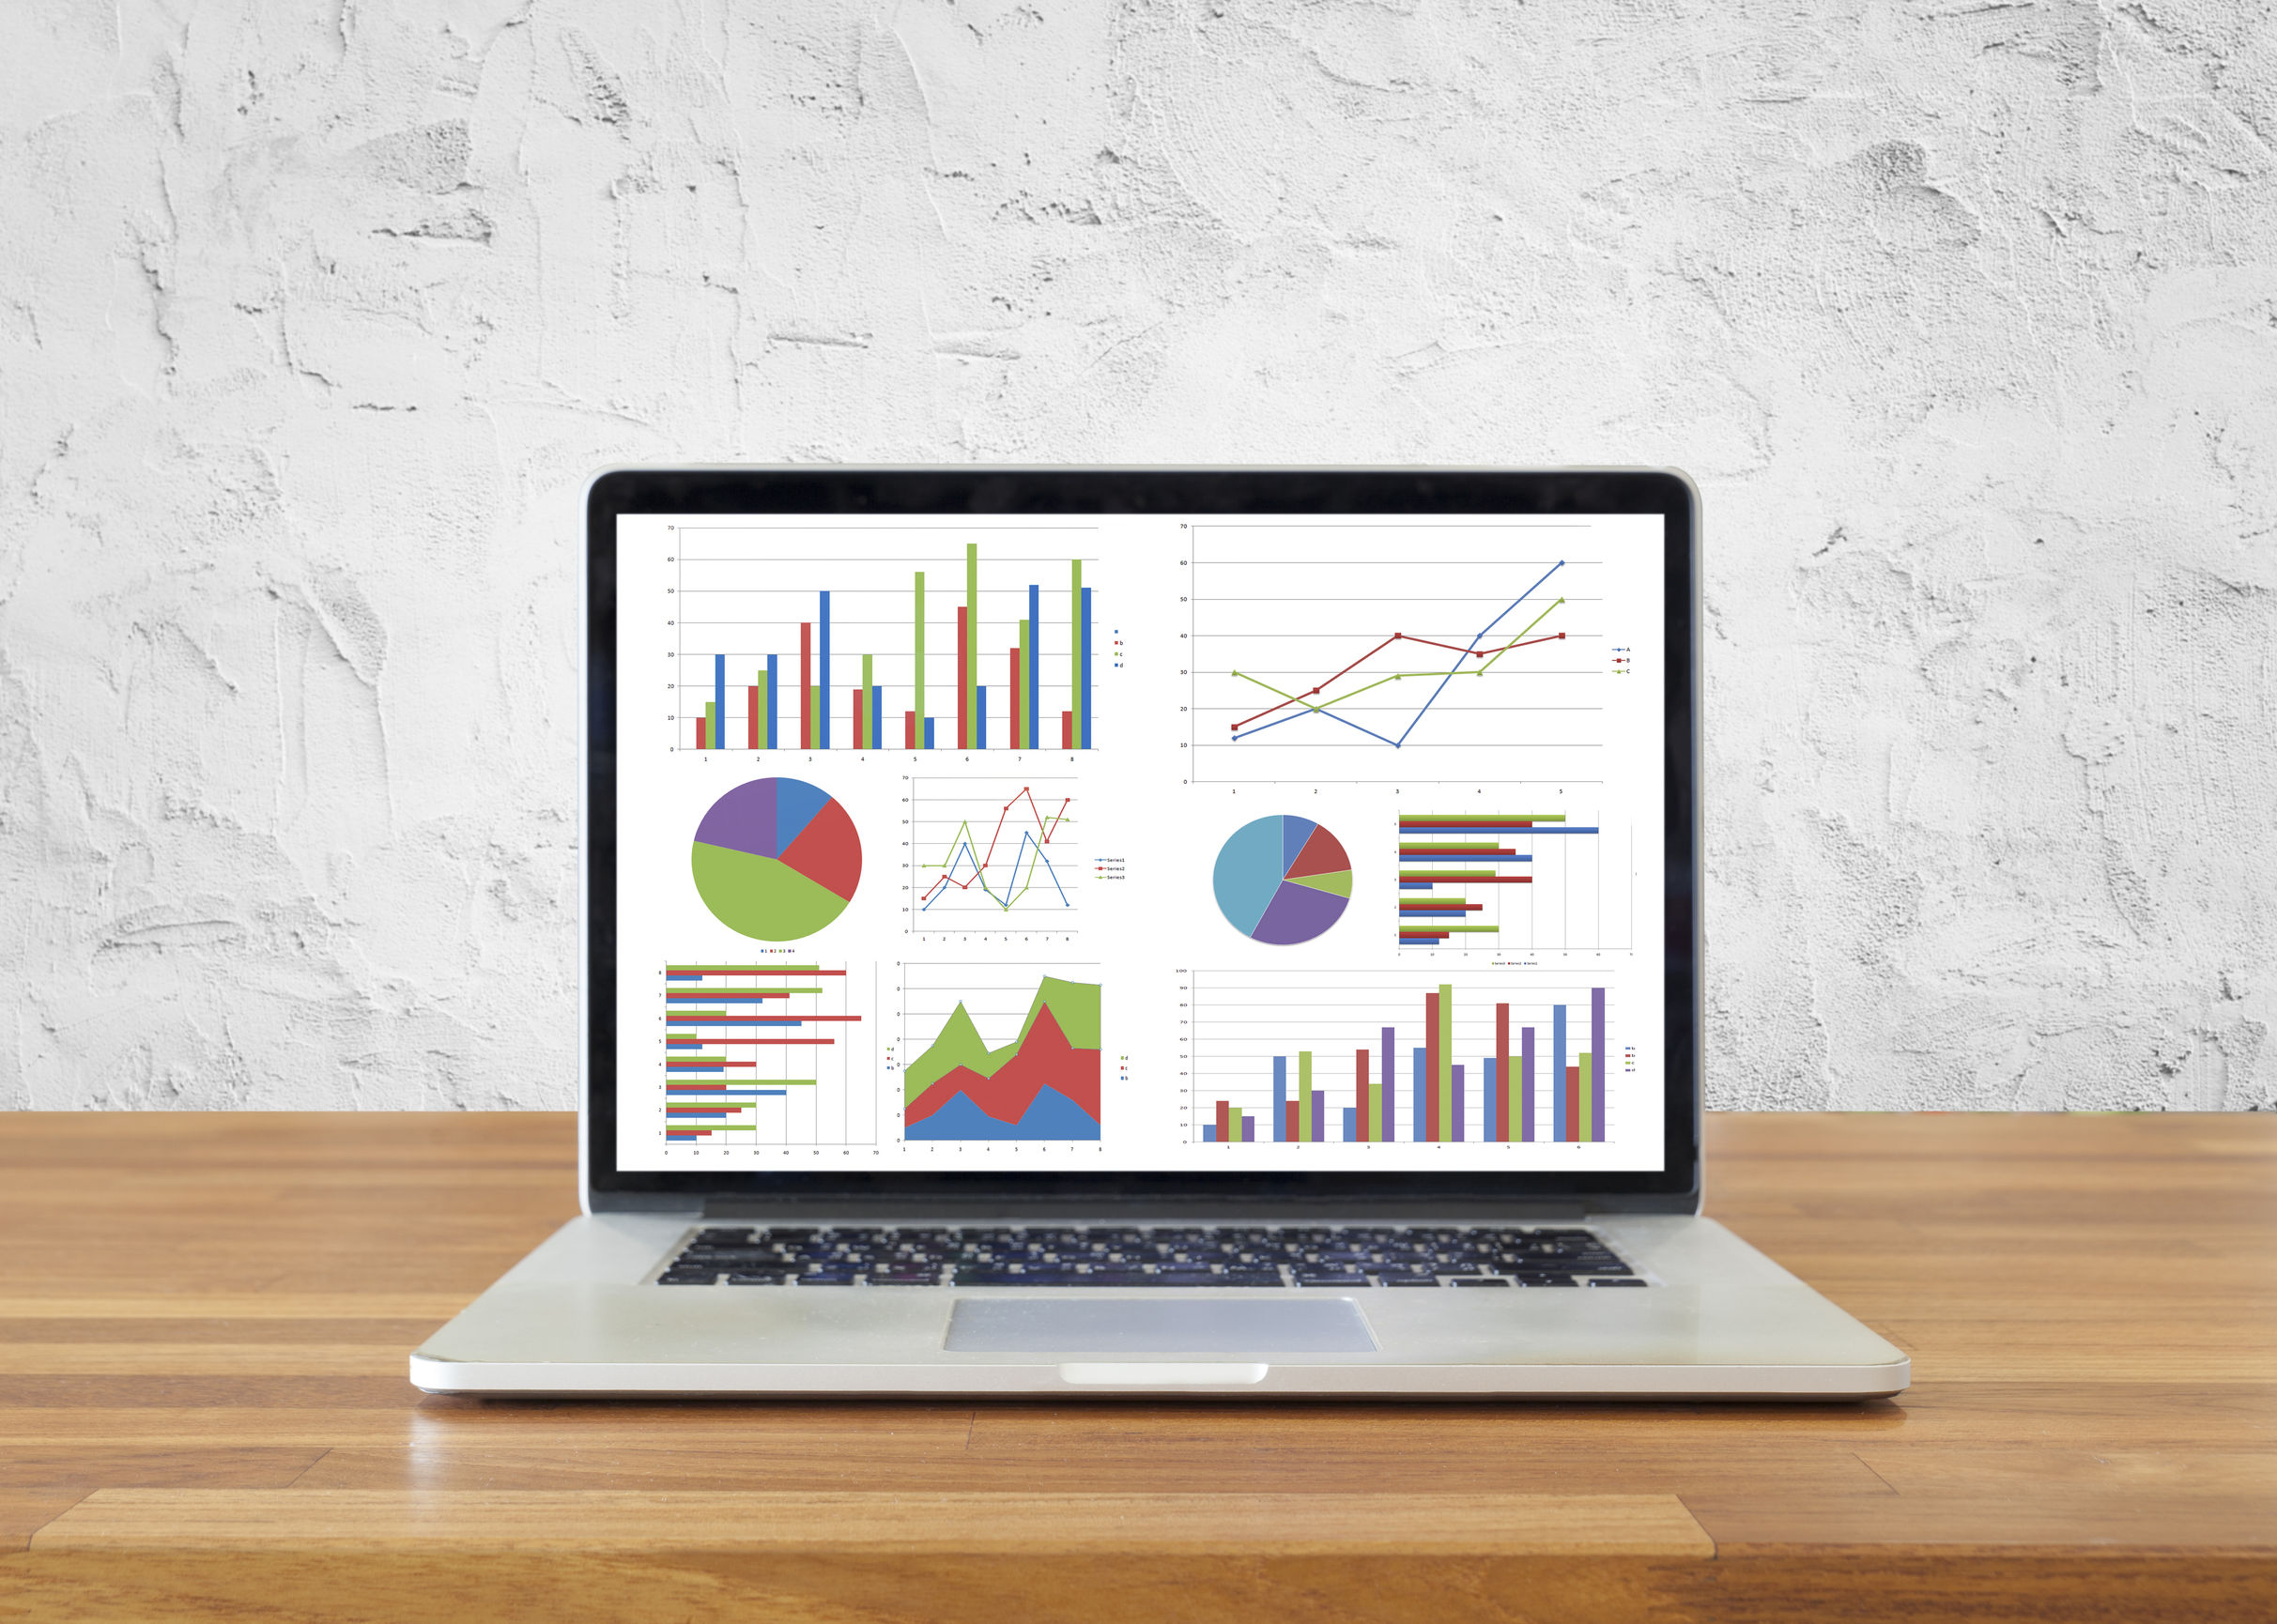 Major Digital Media Platforms Reveal New Statistics and Ad Features